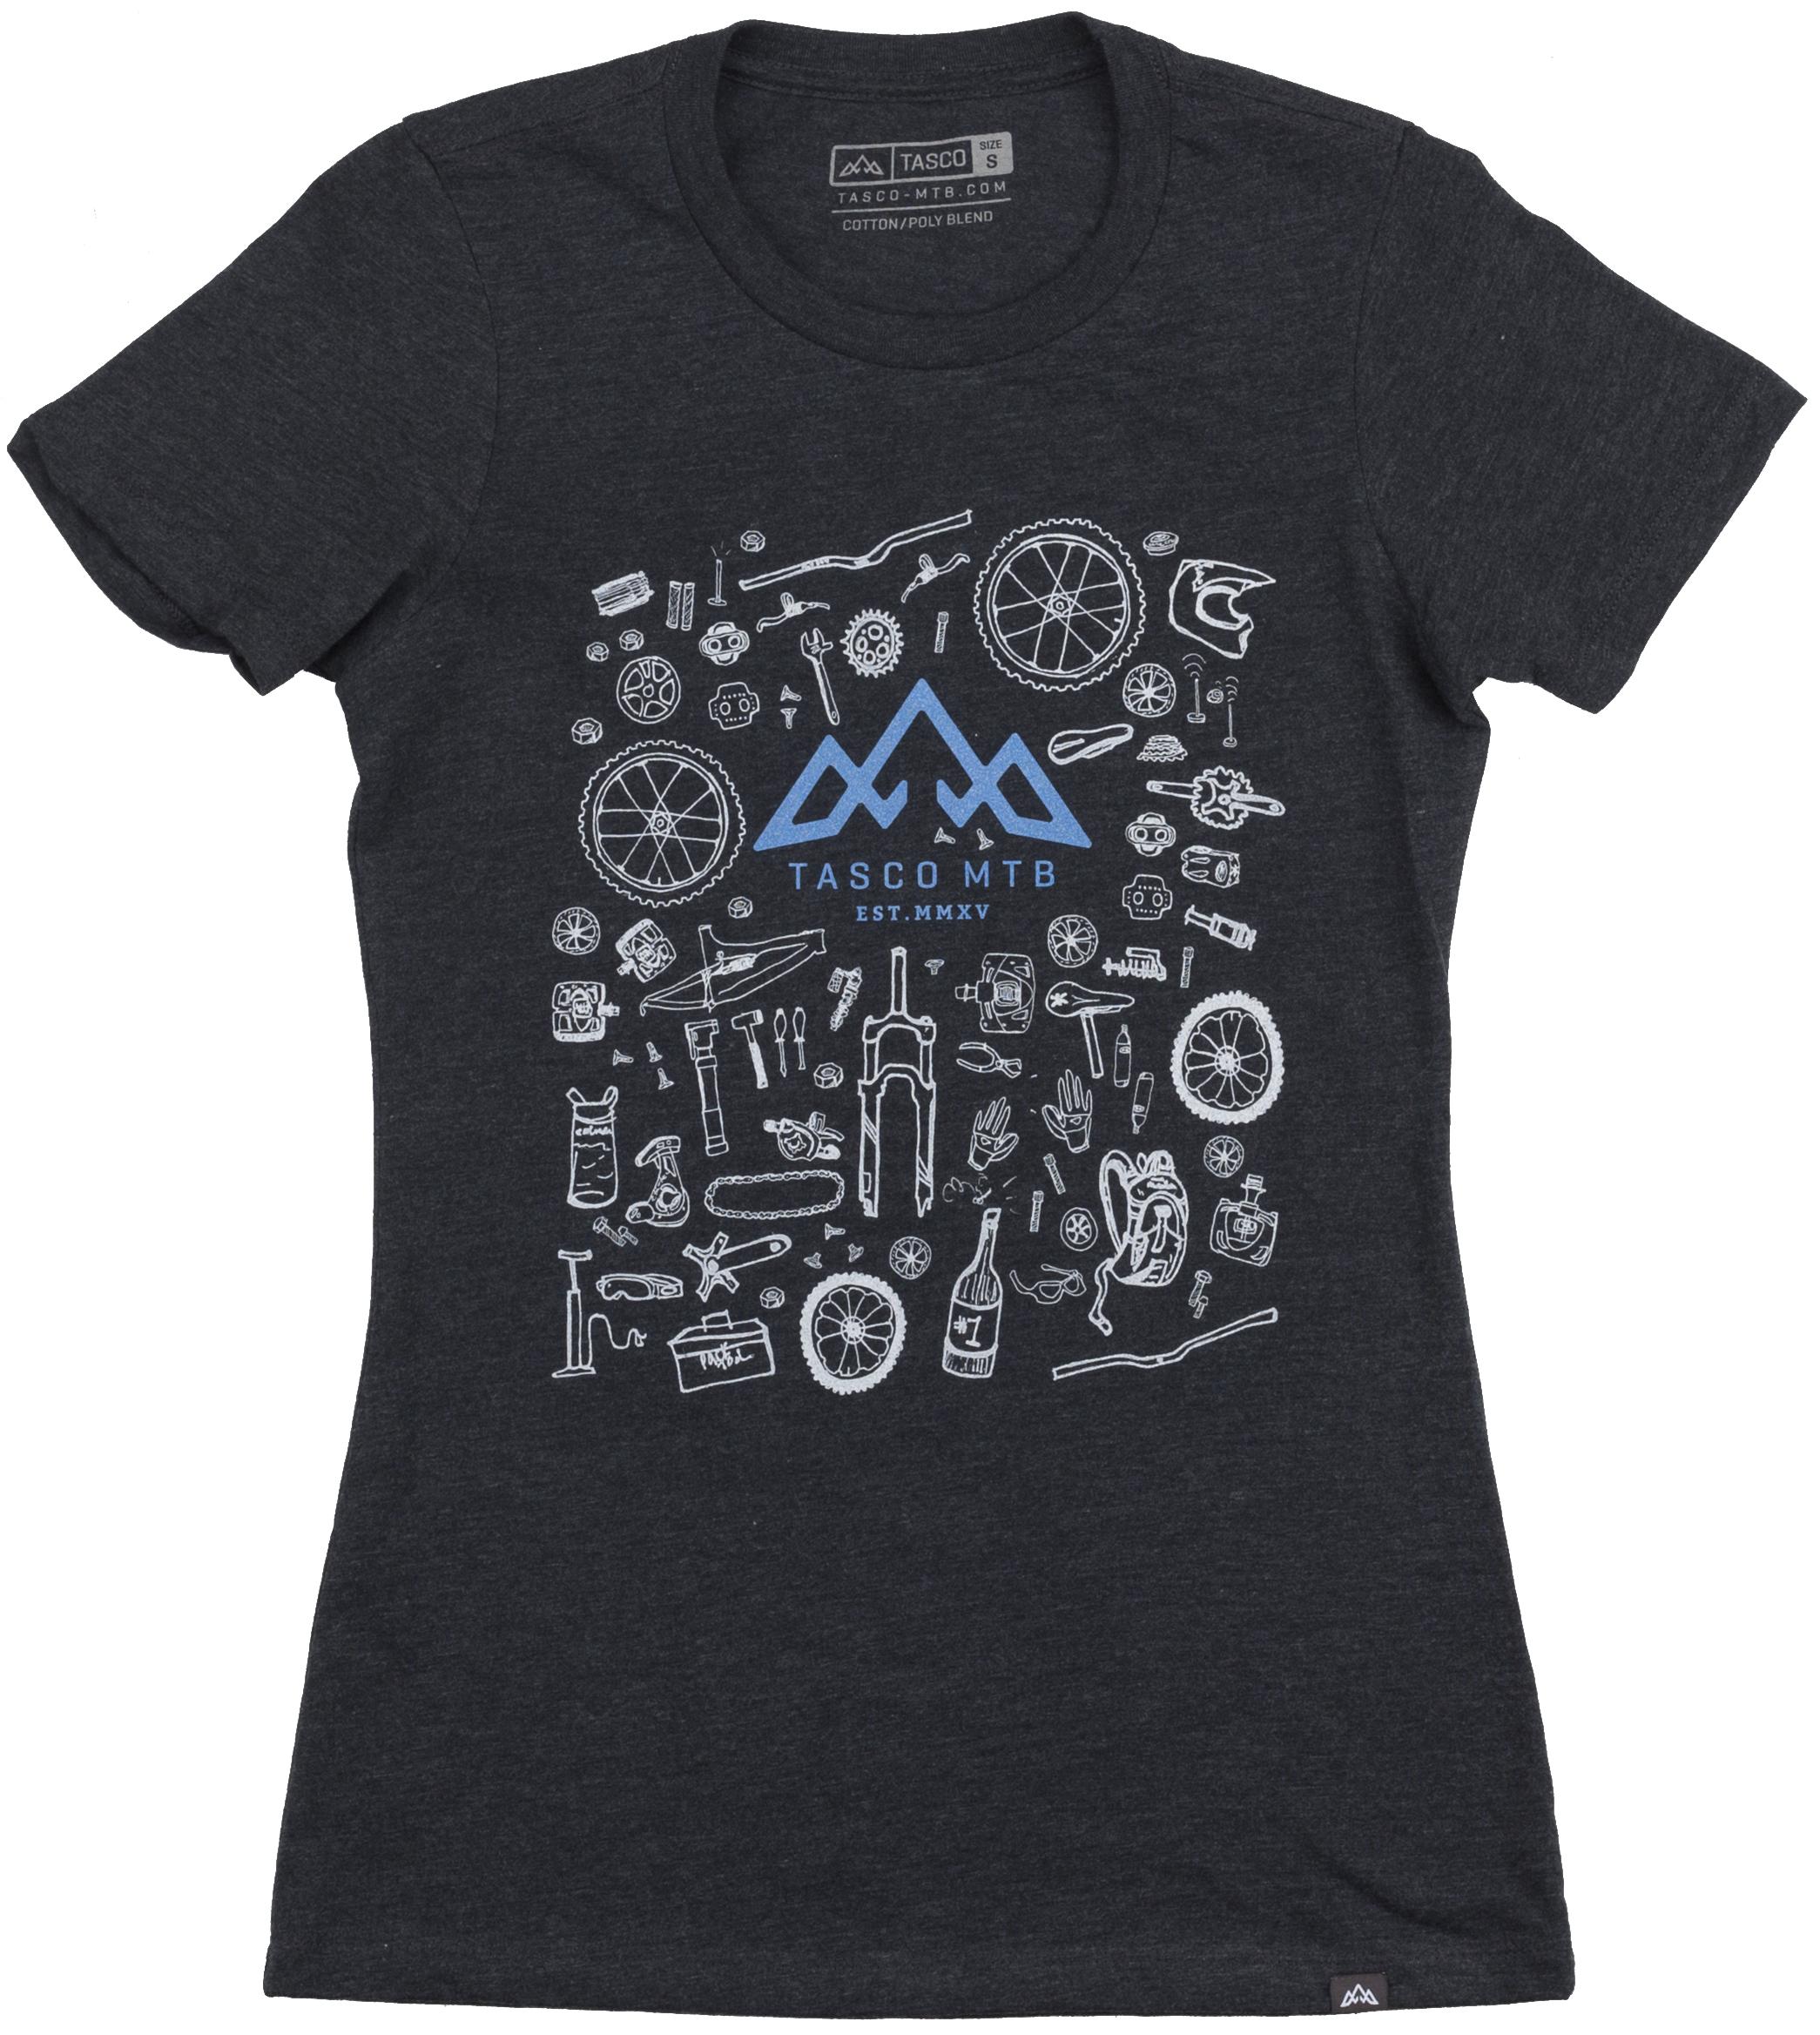 Tasco Rad Series/Bike Bits Wmn's T-Shirt Women's Size Small in Charcoal